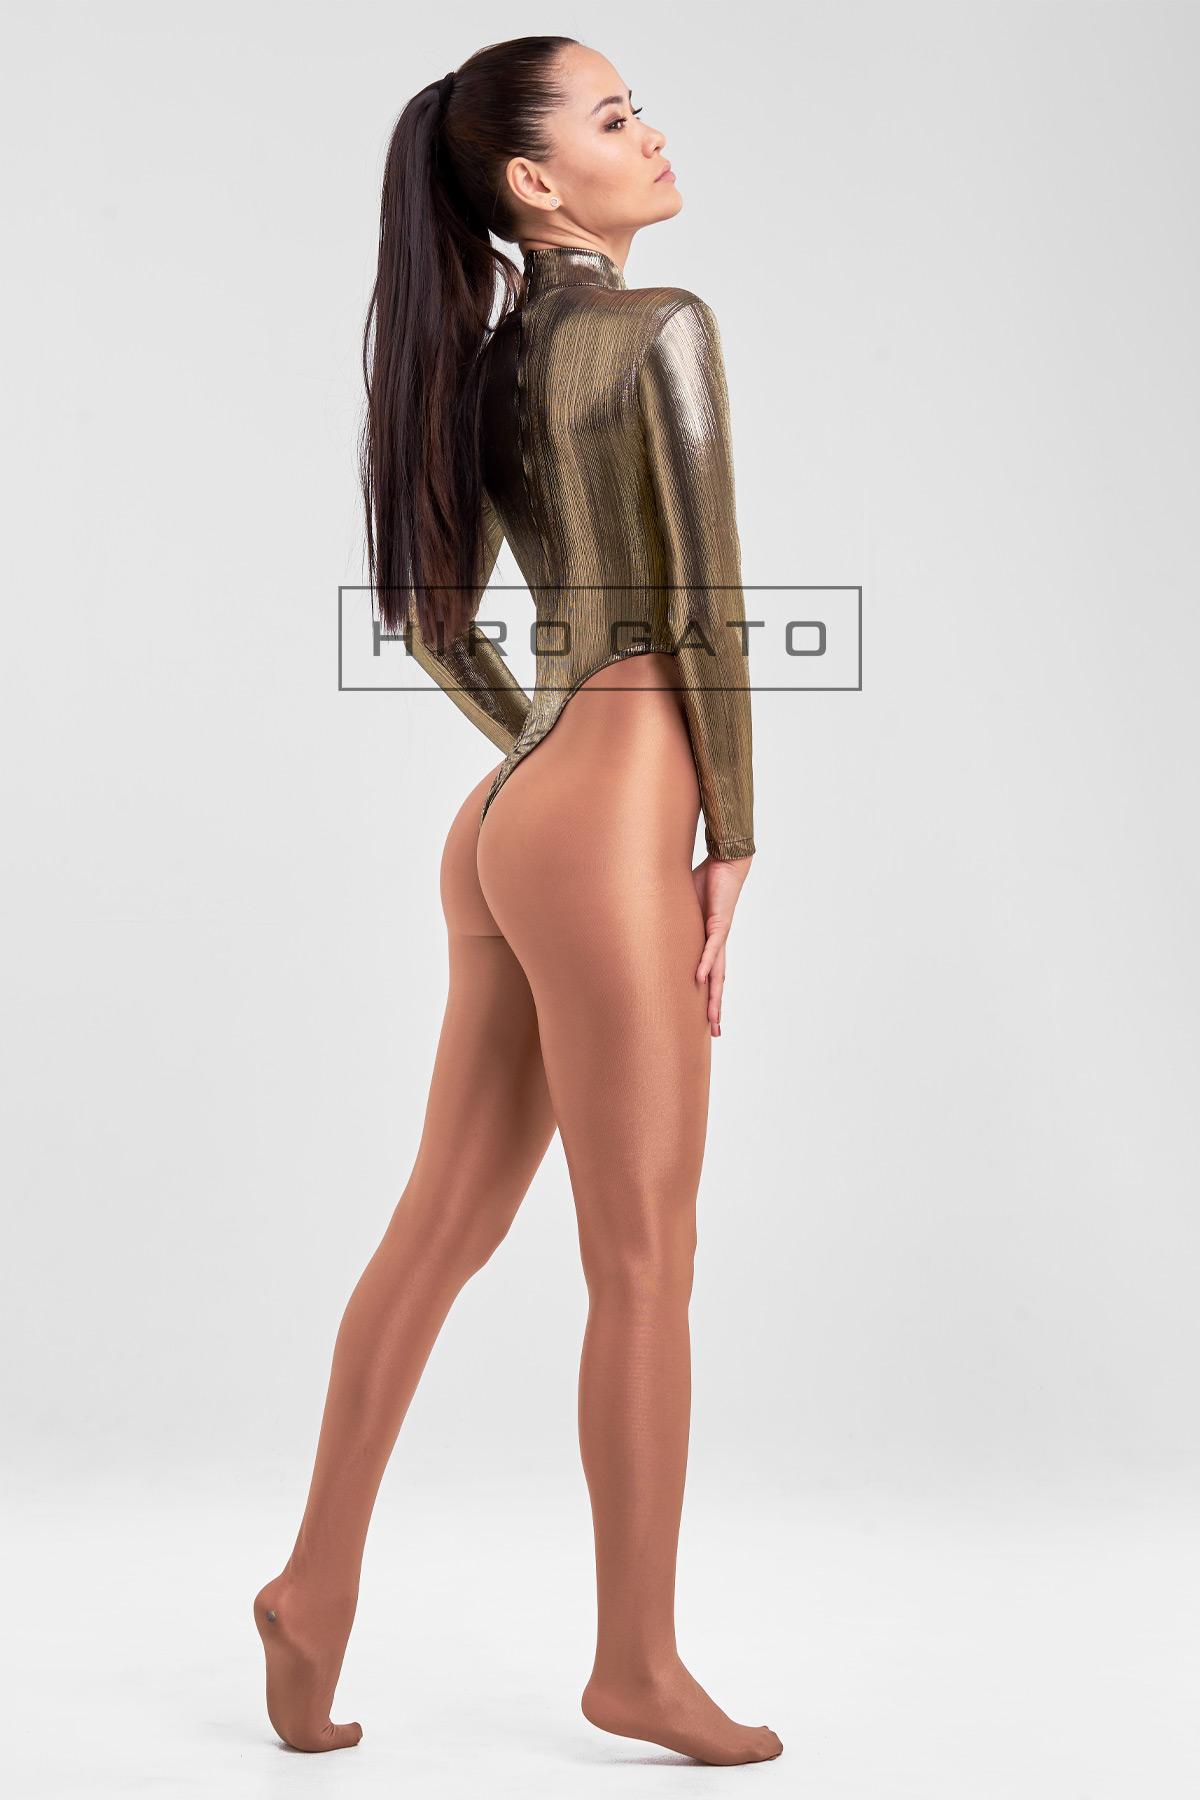 Gymnastikanzug Hoch Geschnitten Shiny Spandex Lycra Body Gold